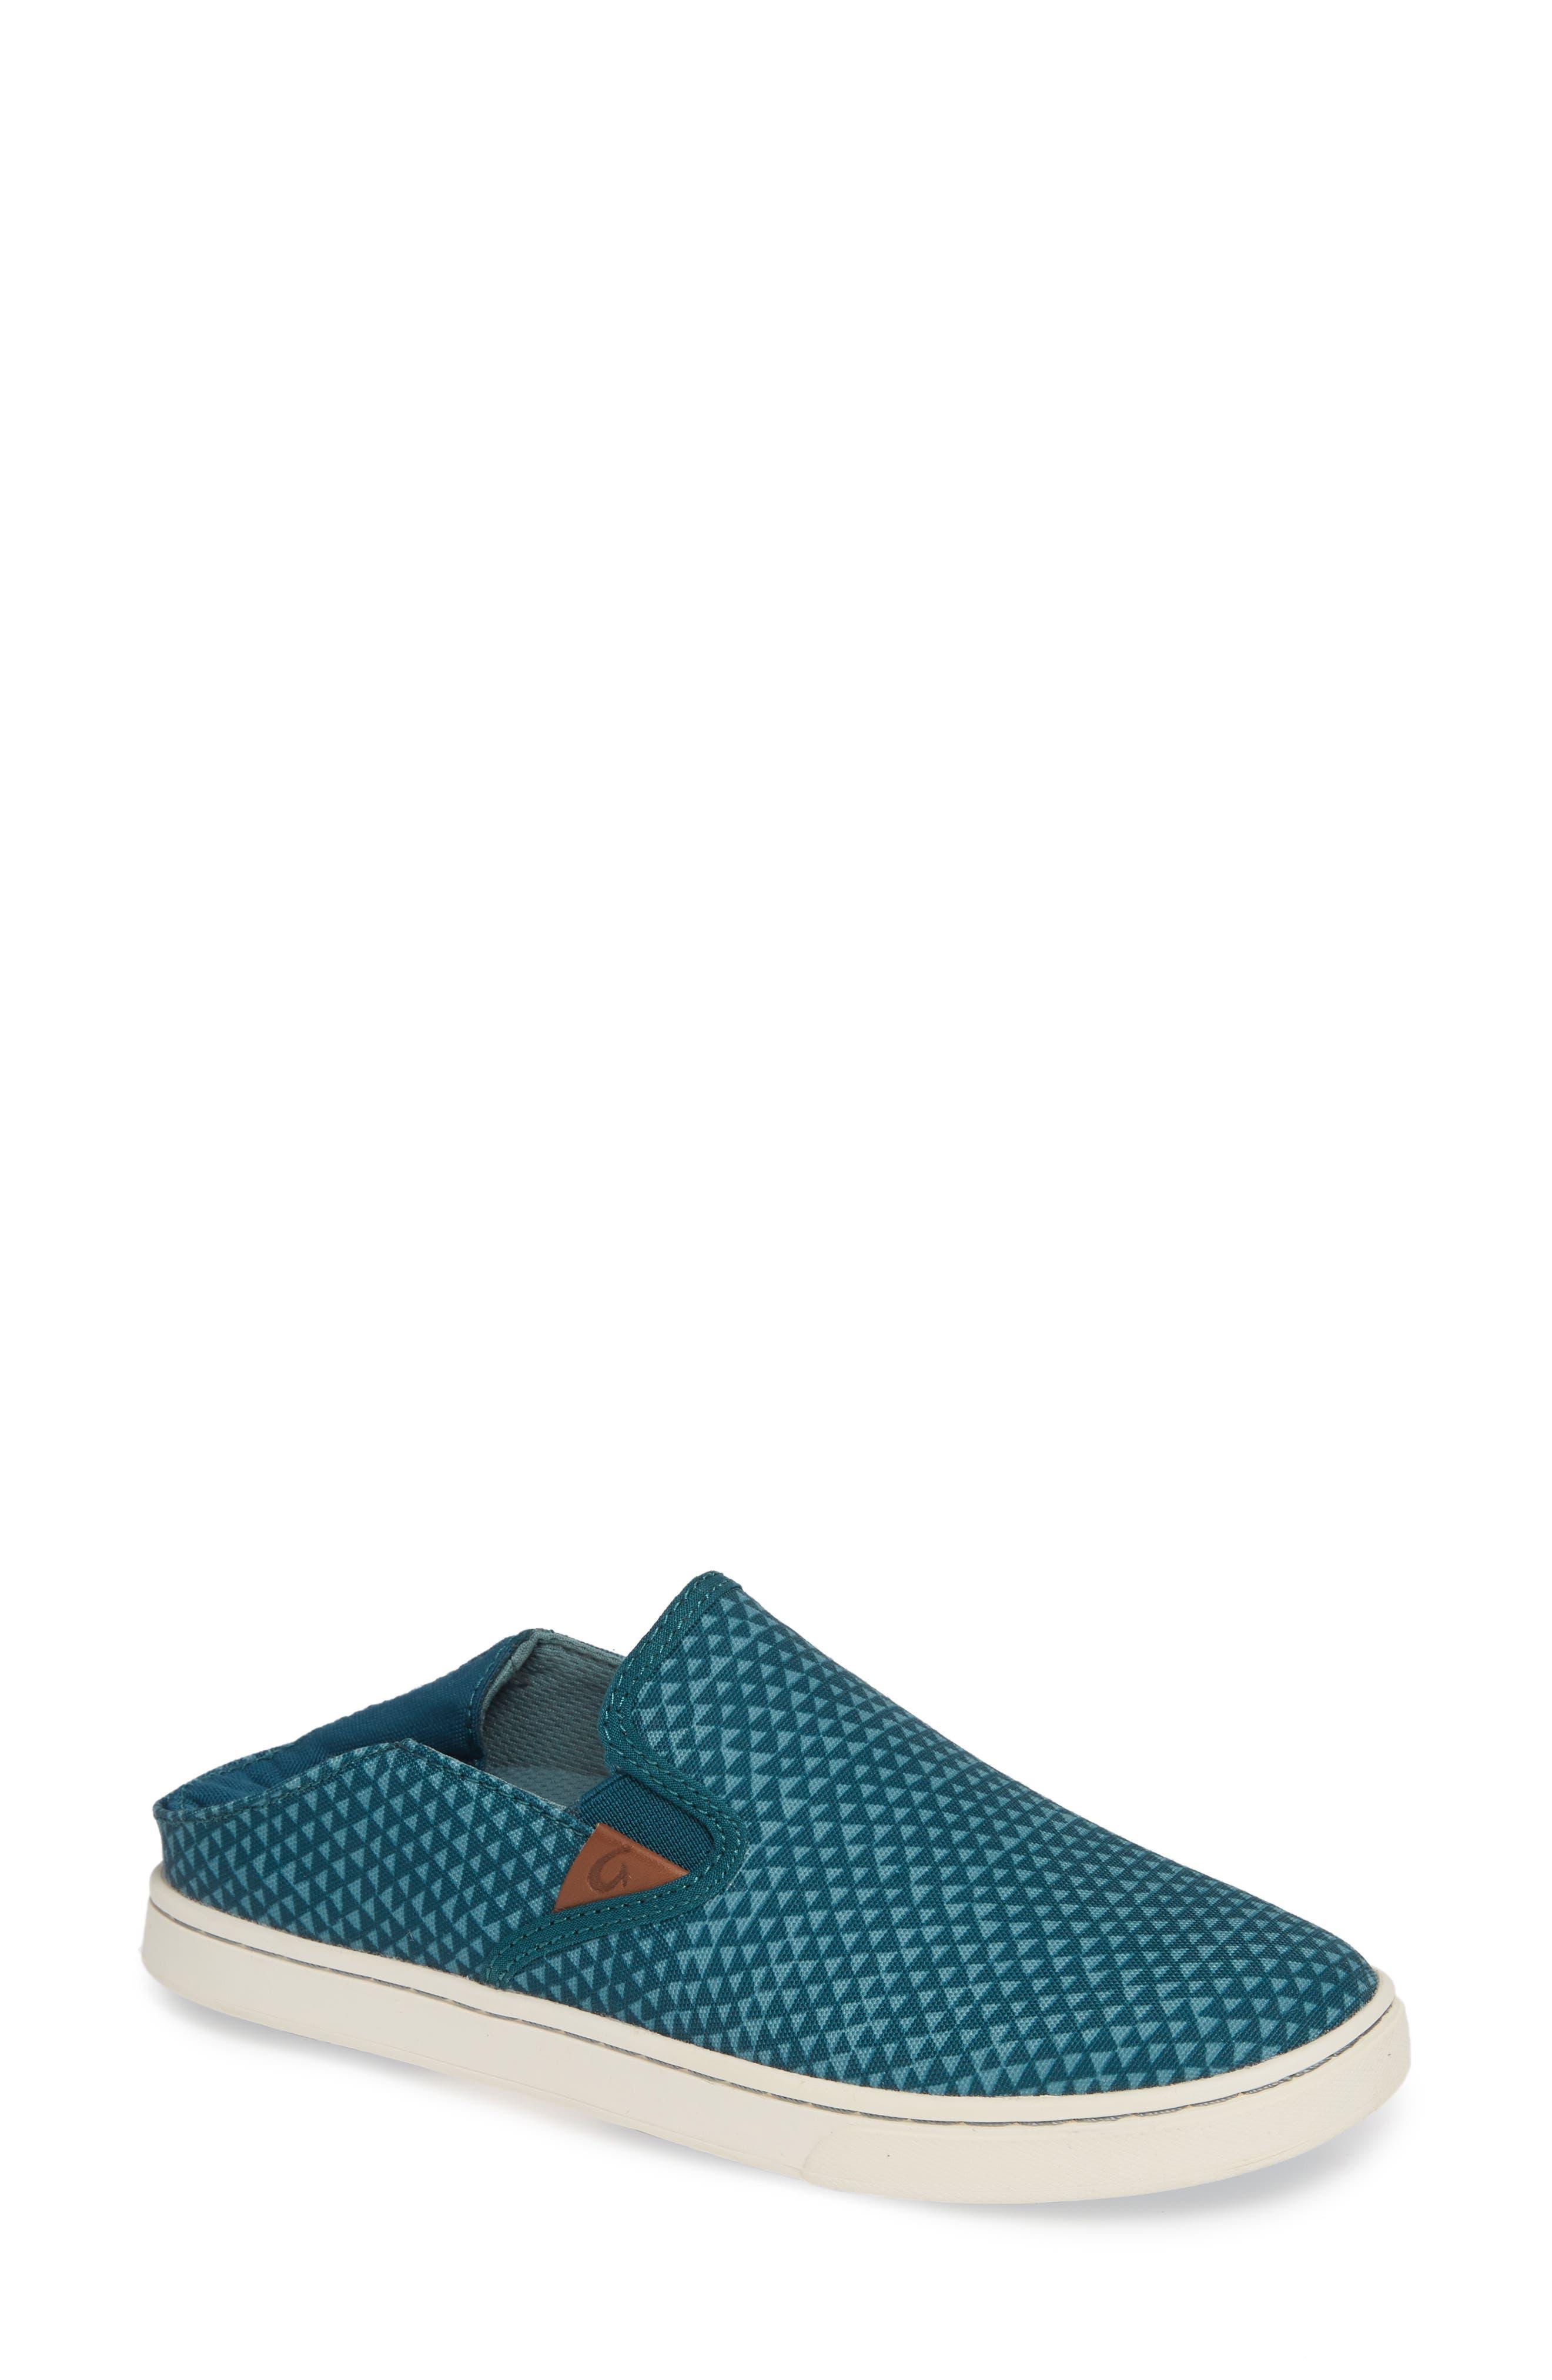 Pehuea Pa'i Convertible Sneaker,                         Main,                         color, DEEP TEAL/ TRIANGLE FABRIC